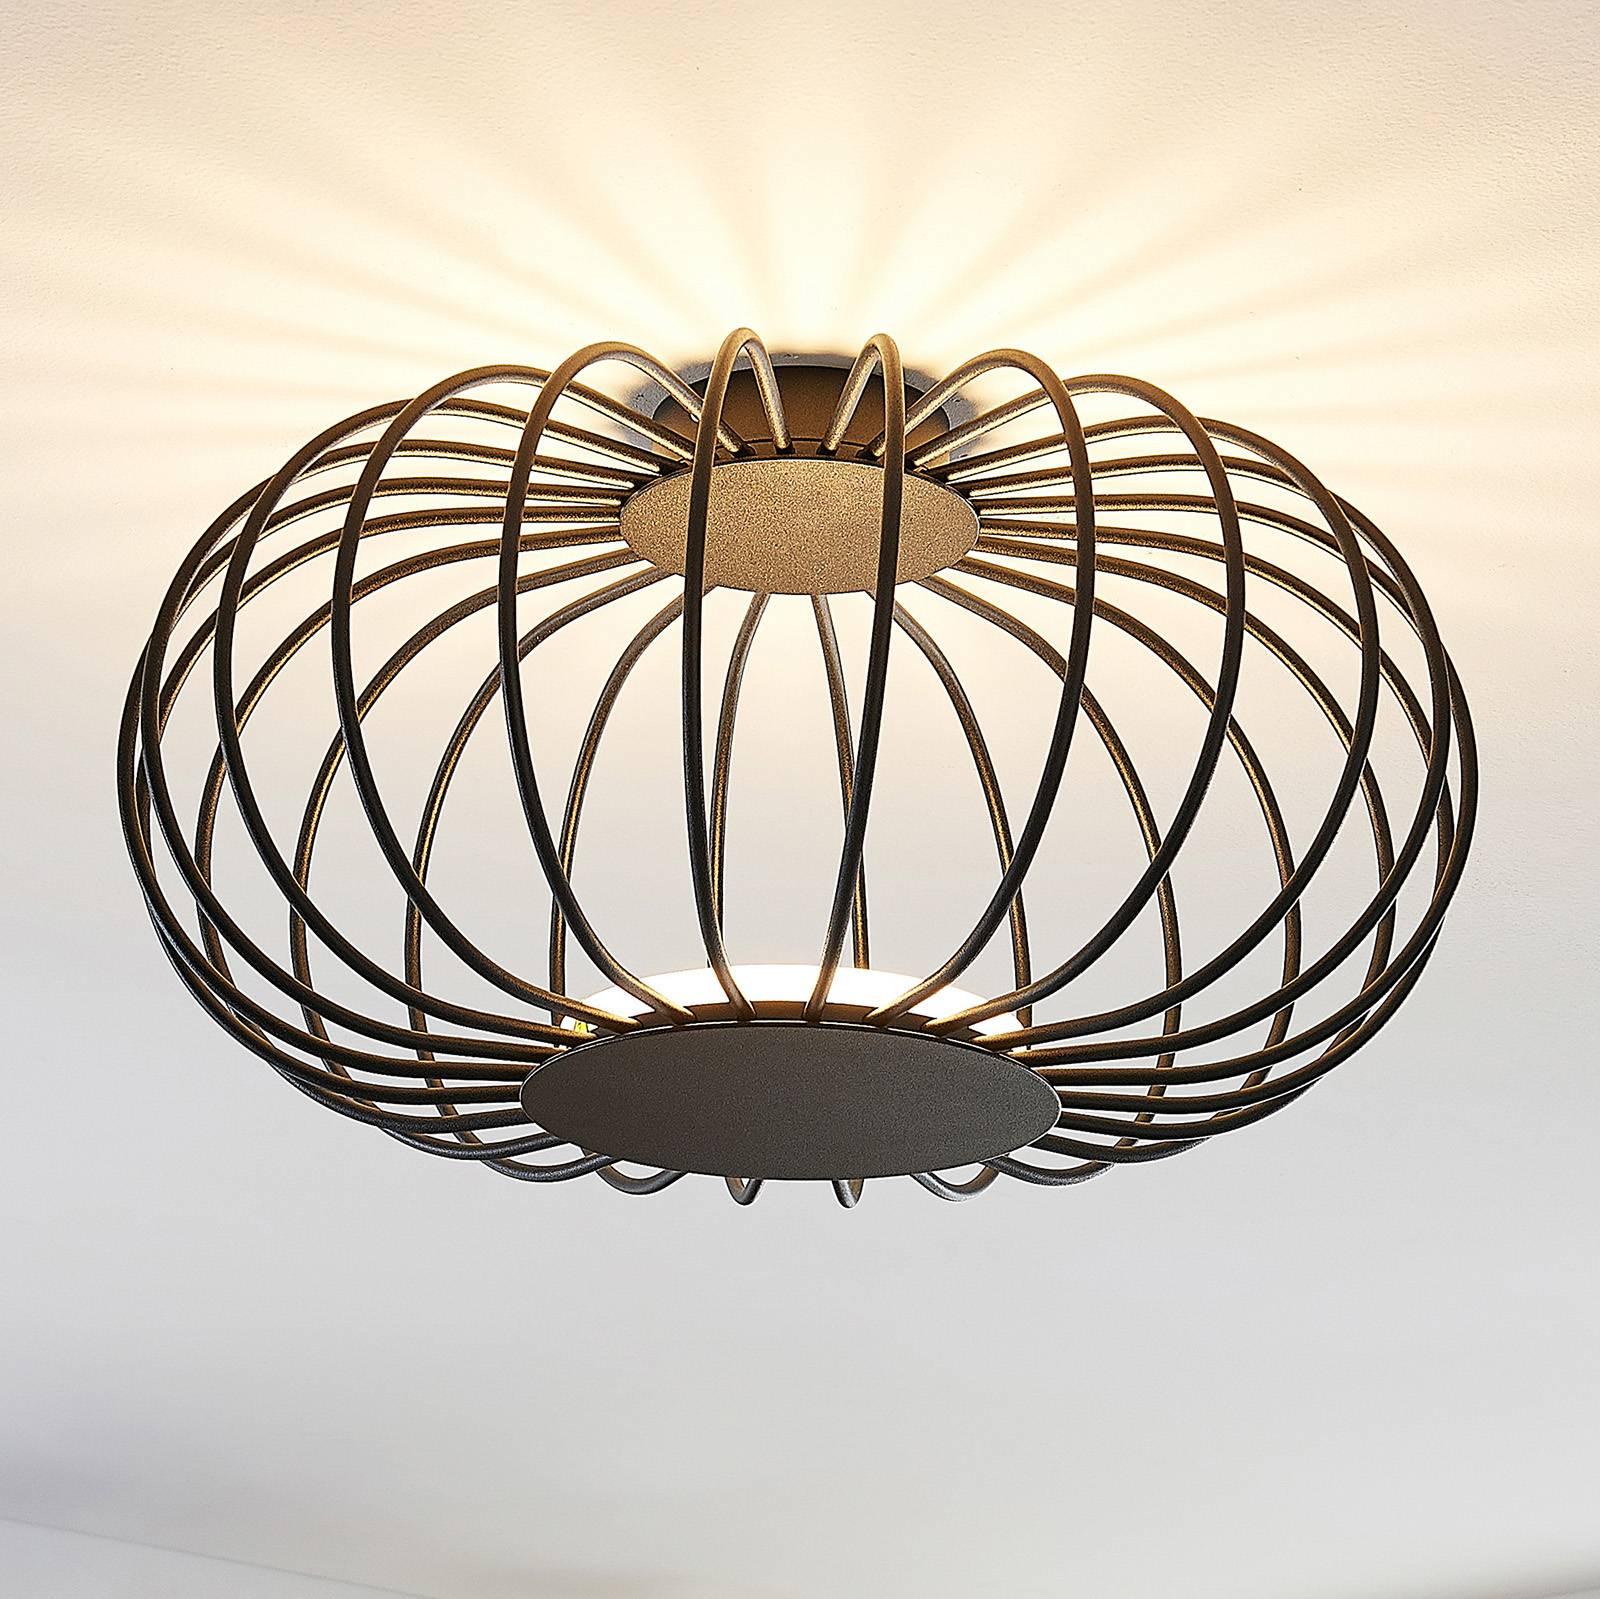 Lucande Lusine LED-kattovalaisin, musta